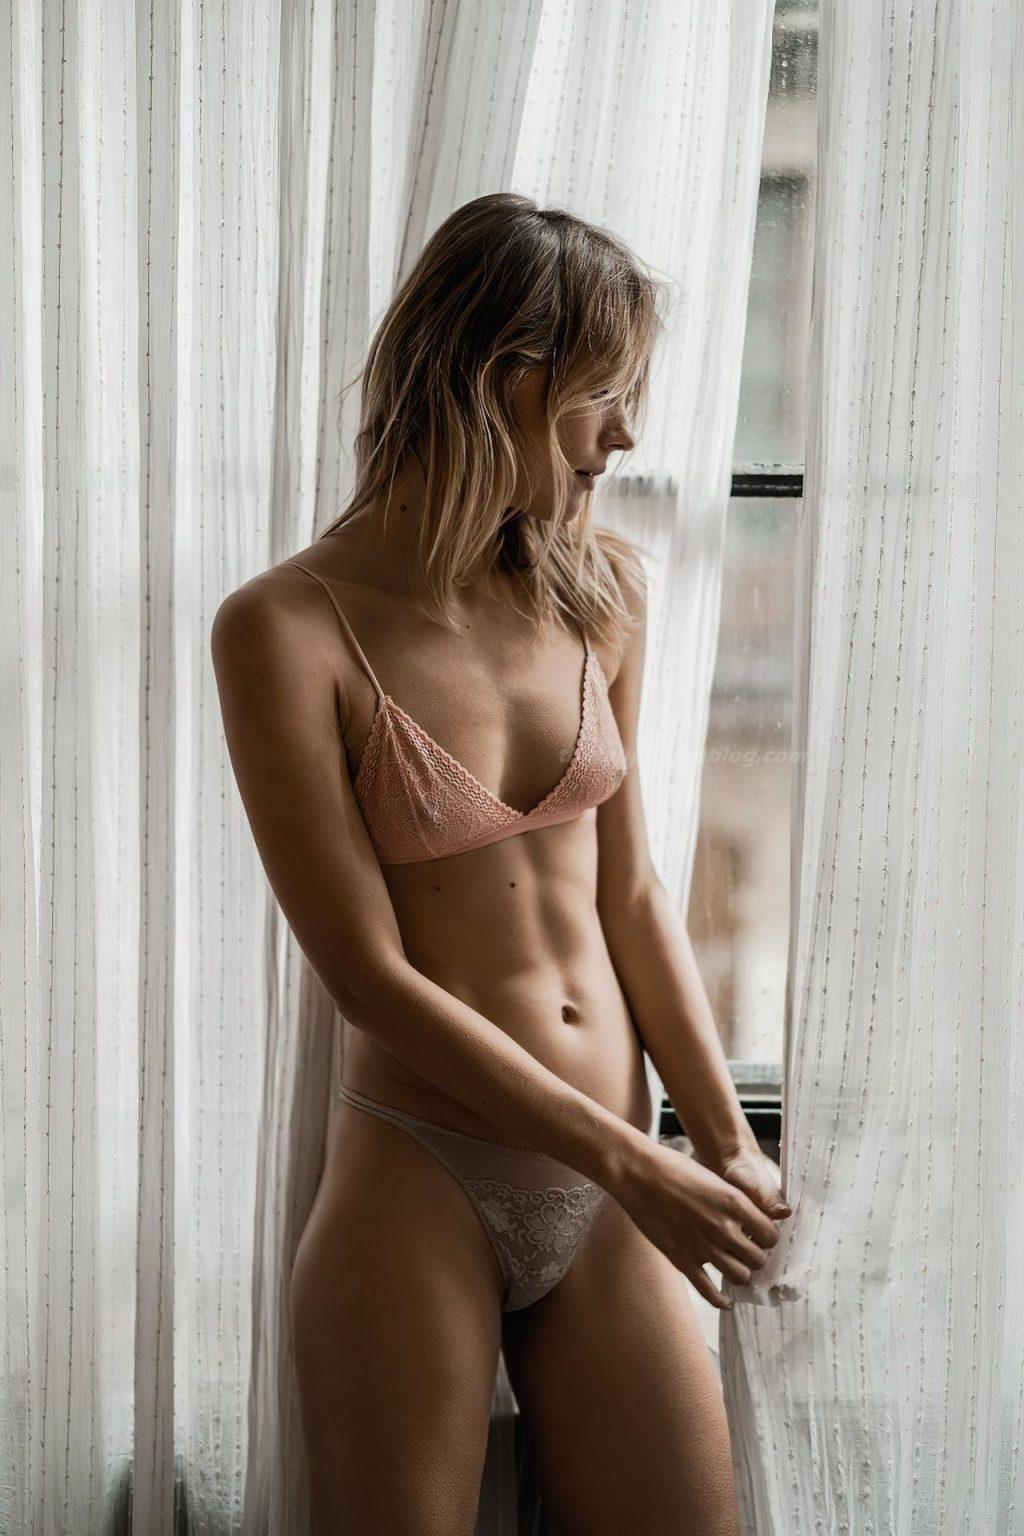 Lize Römer Shows Off Her Nipples (15 Photos)